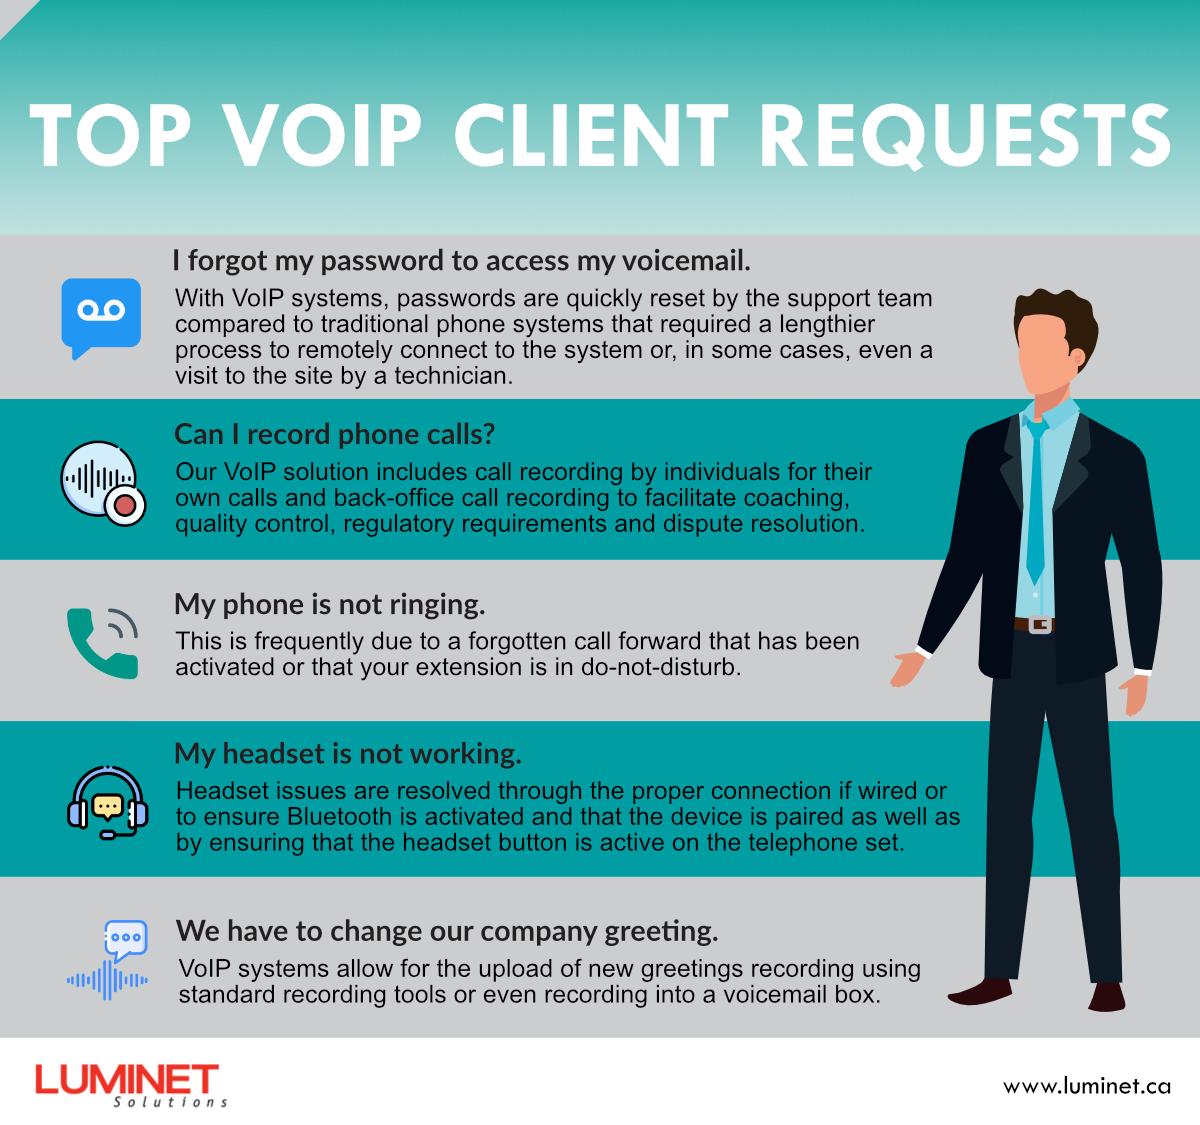 VoIP client requests